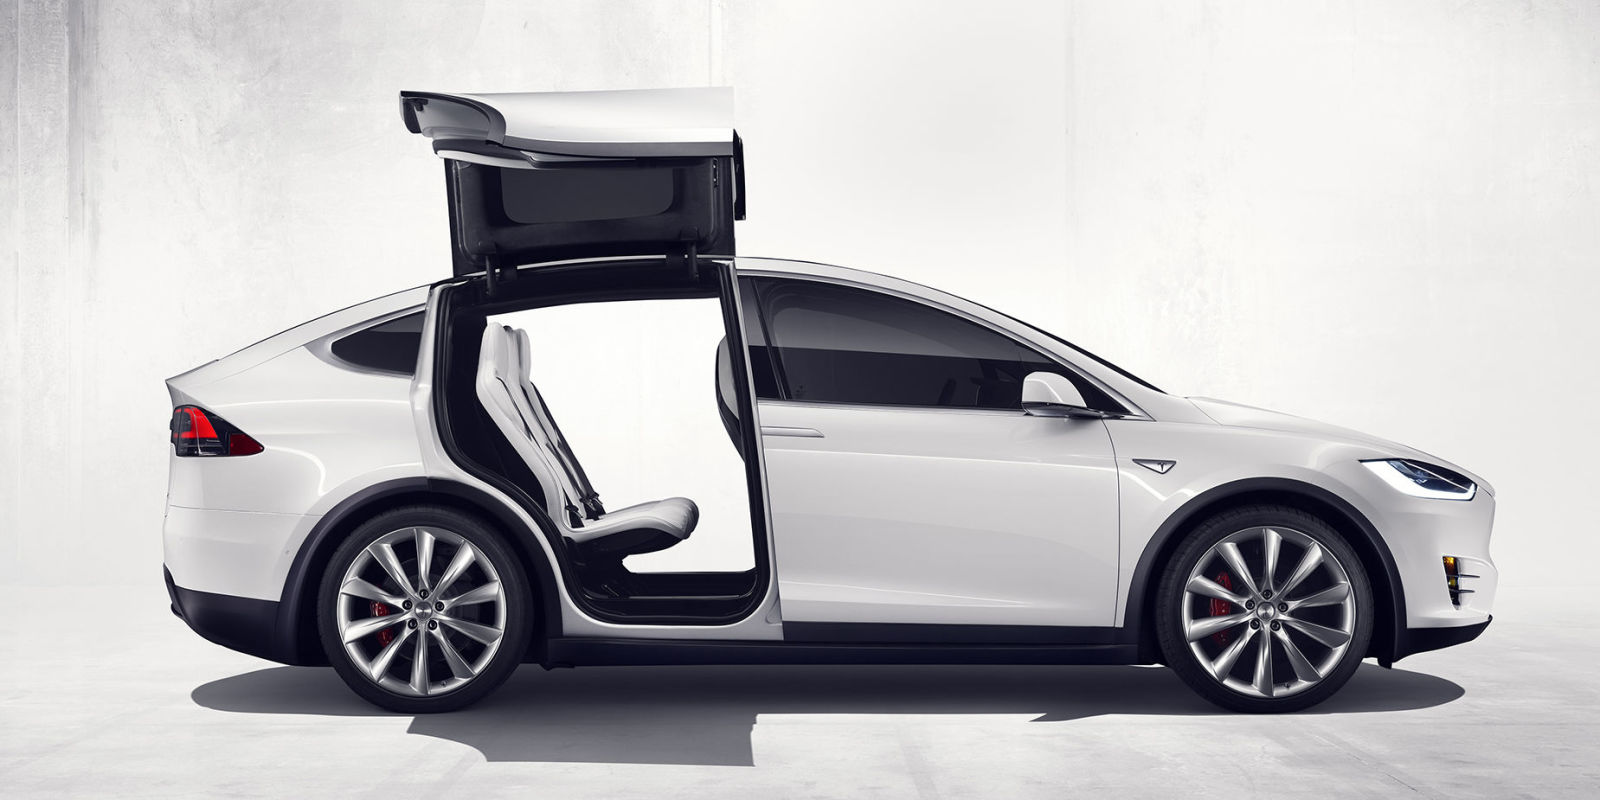 2017 Tesla Model X SUV- White-side